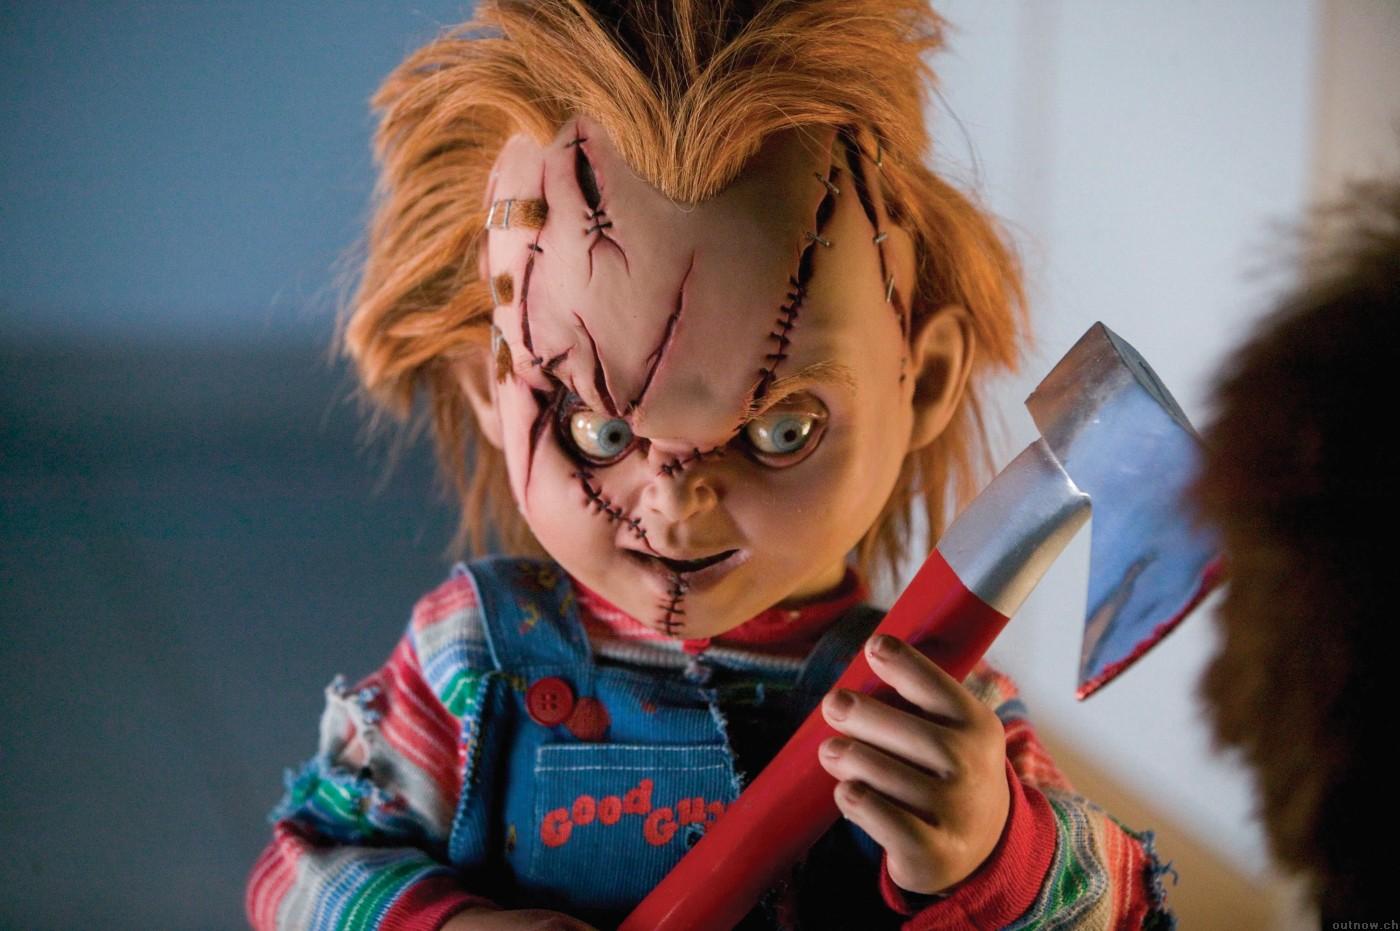 Jack Boneco Assassino Beautiful unhas da semana - chucky, o boneco assassino! | beauty rock